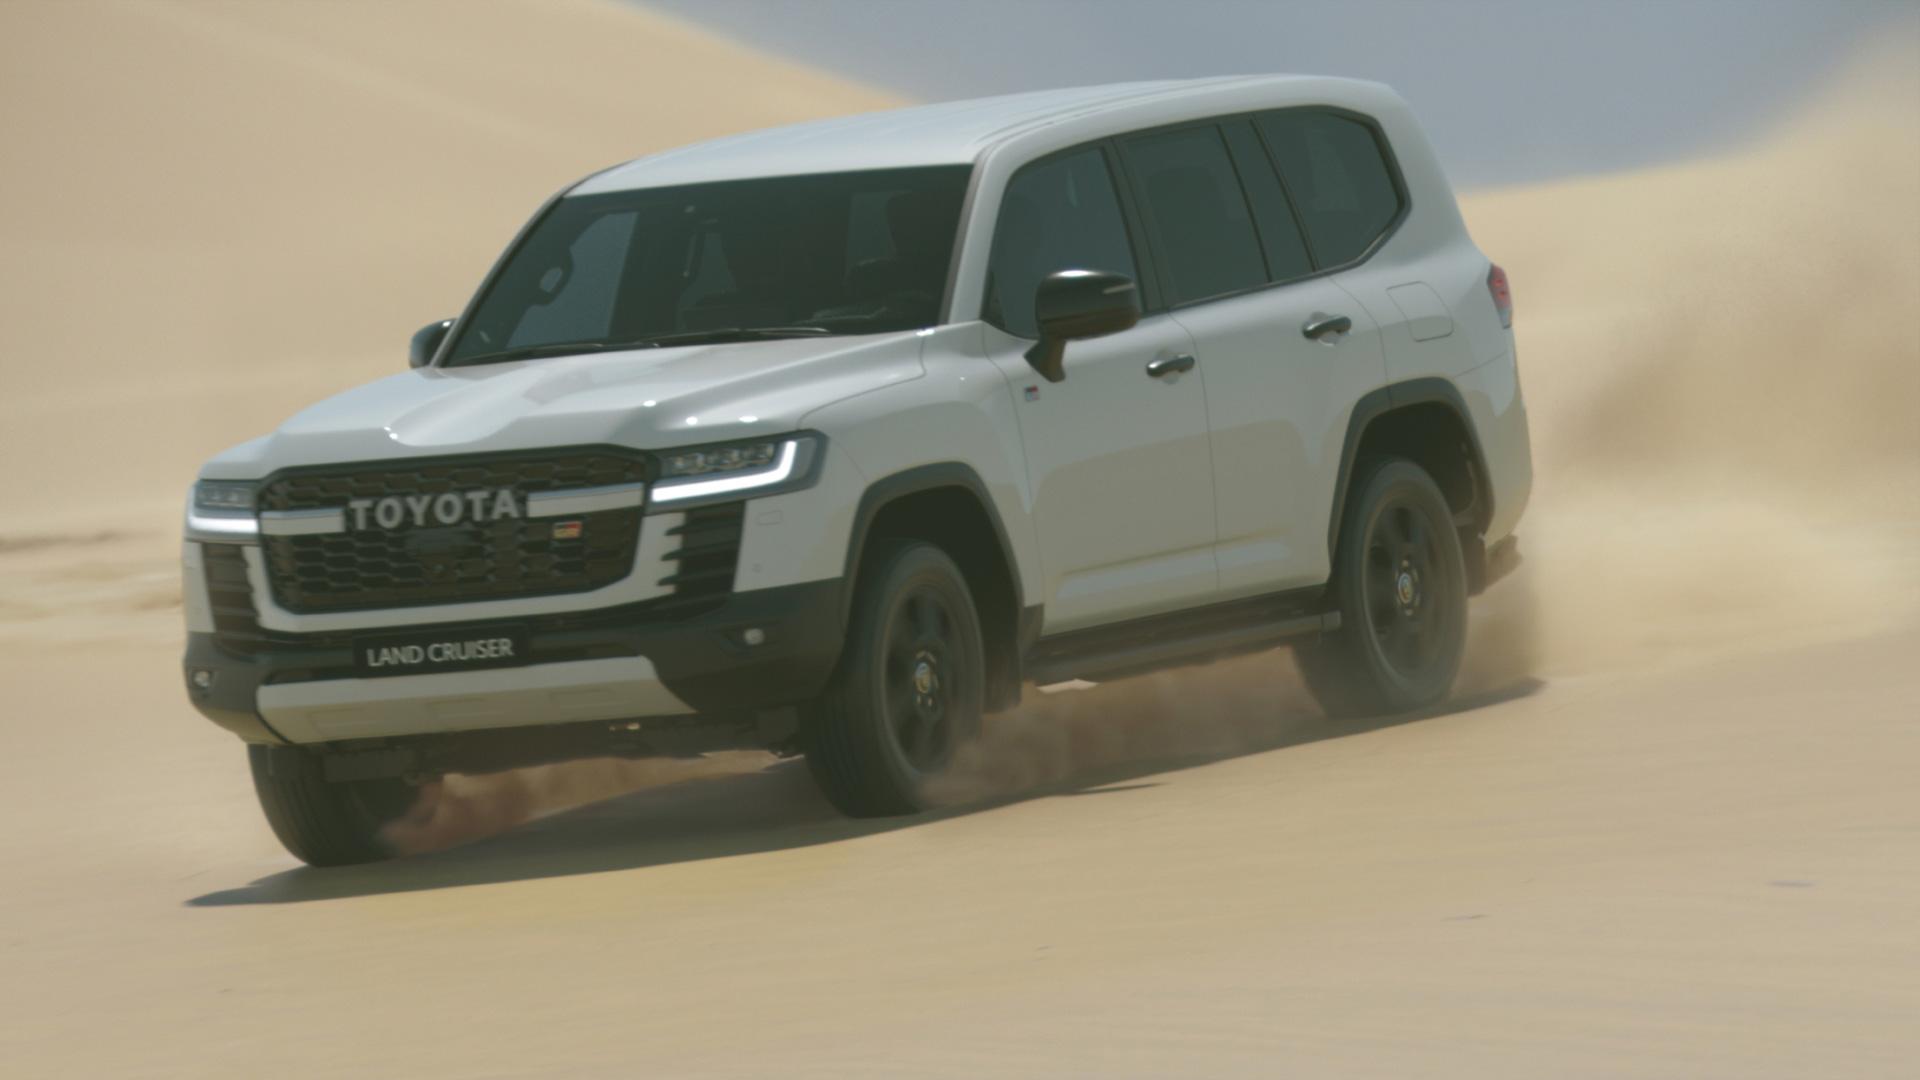 Toyota's New Land Cruiser Makes World Premiere - Image 5